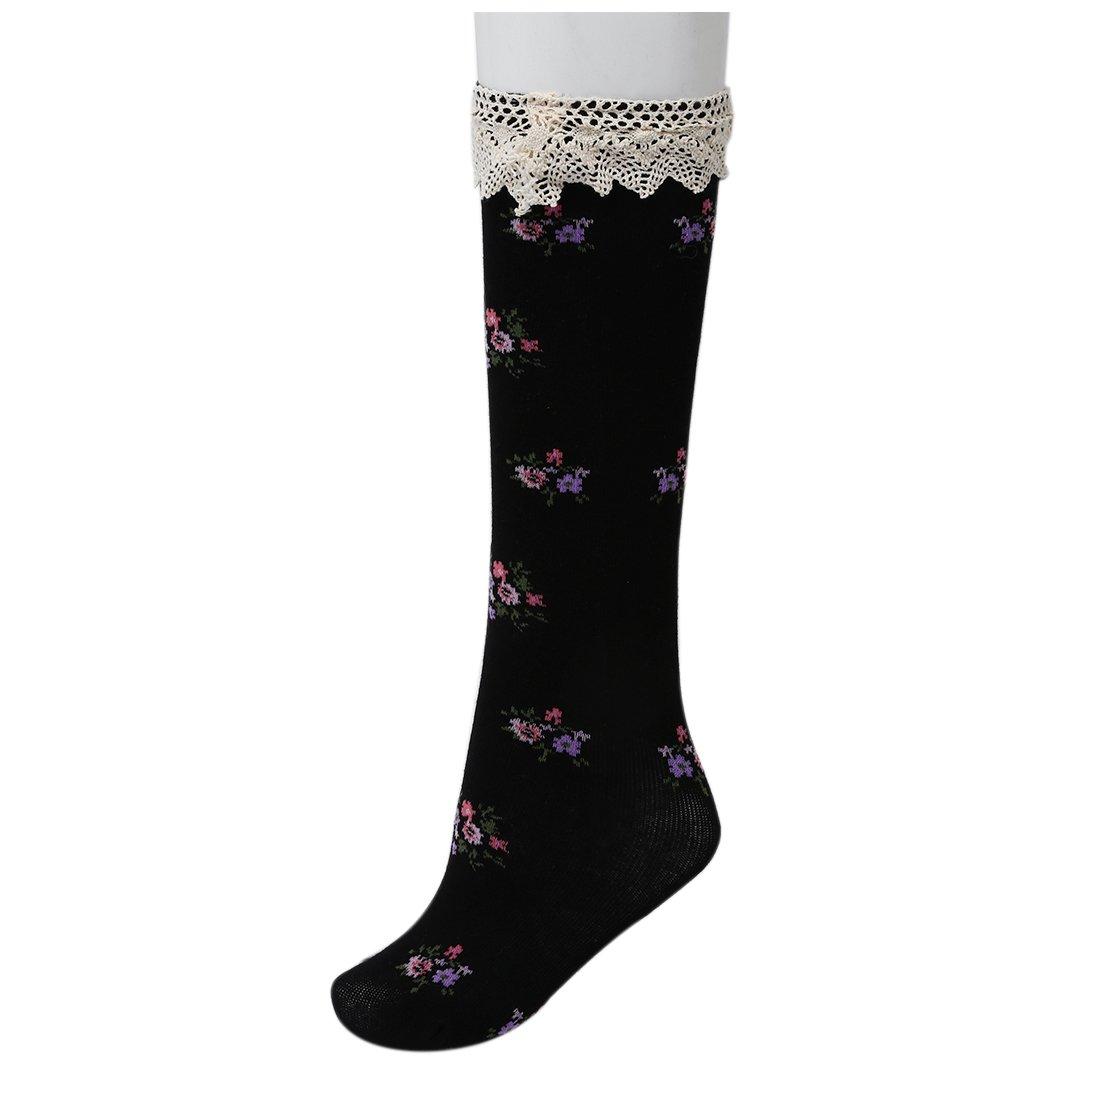 e04aa8e49c9 Amazon.com   Girls High Socks - SODIAL(R)Baby Girls Teens Little Lace  Flower High Socks Knee High In Tube Sock Stockings black   Sports   Outdoors